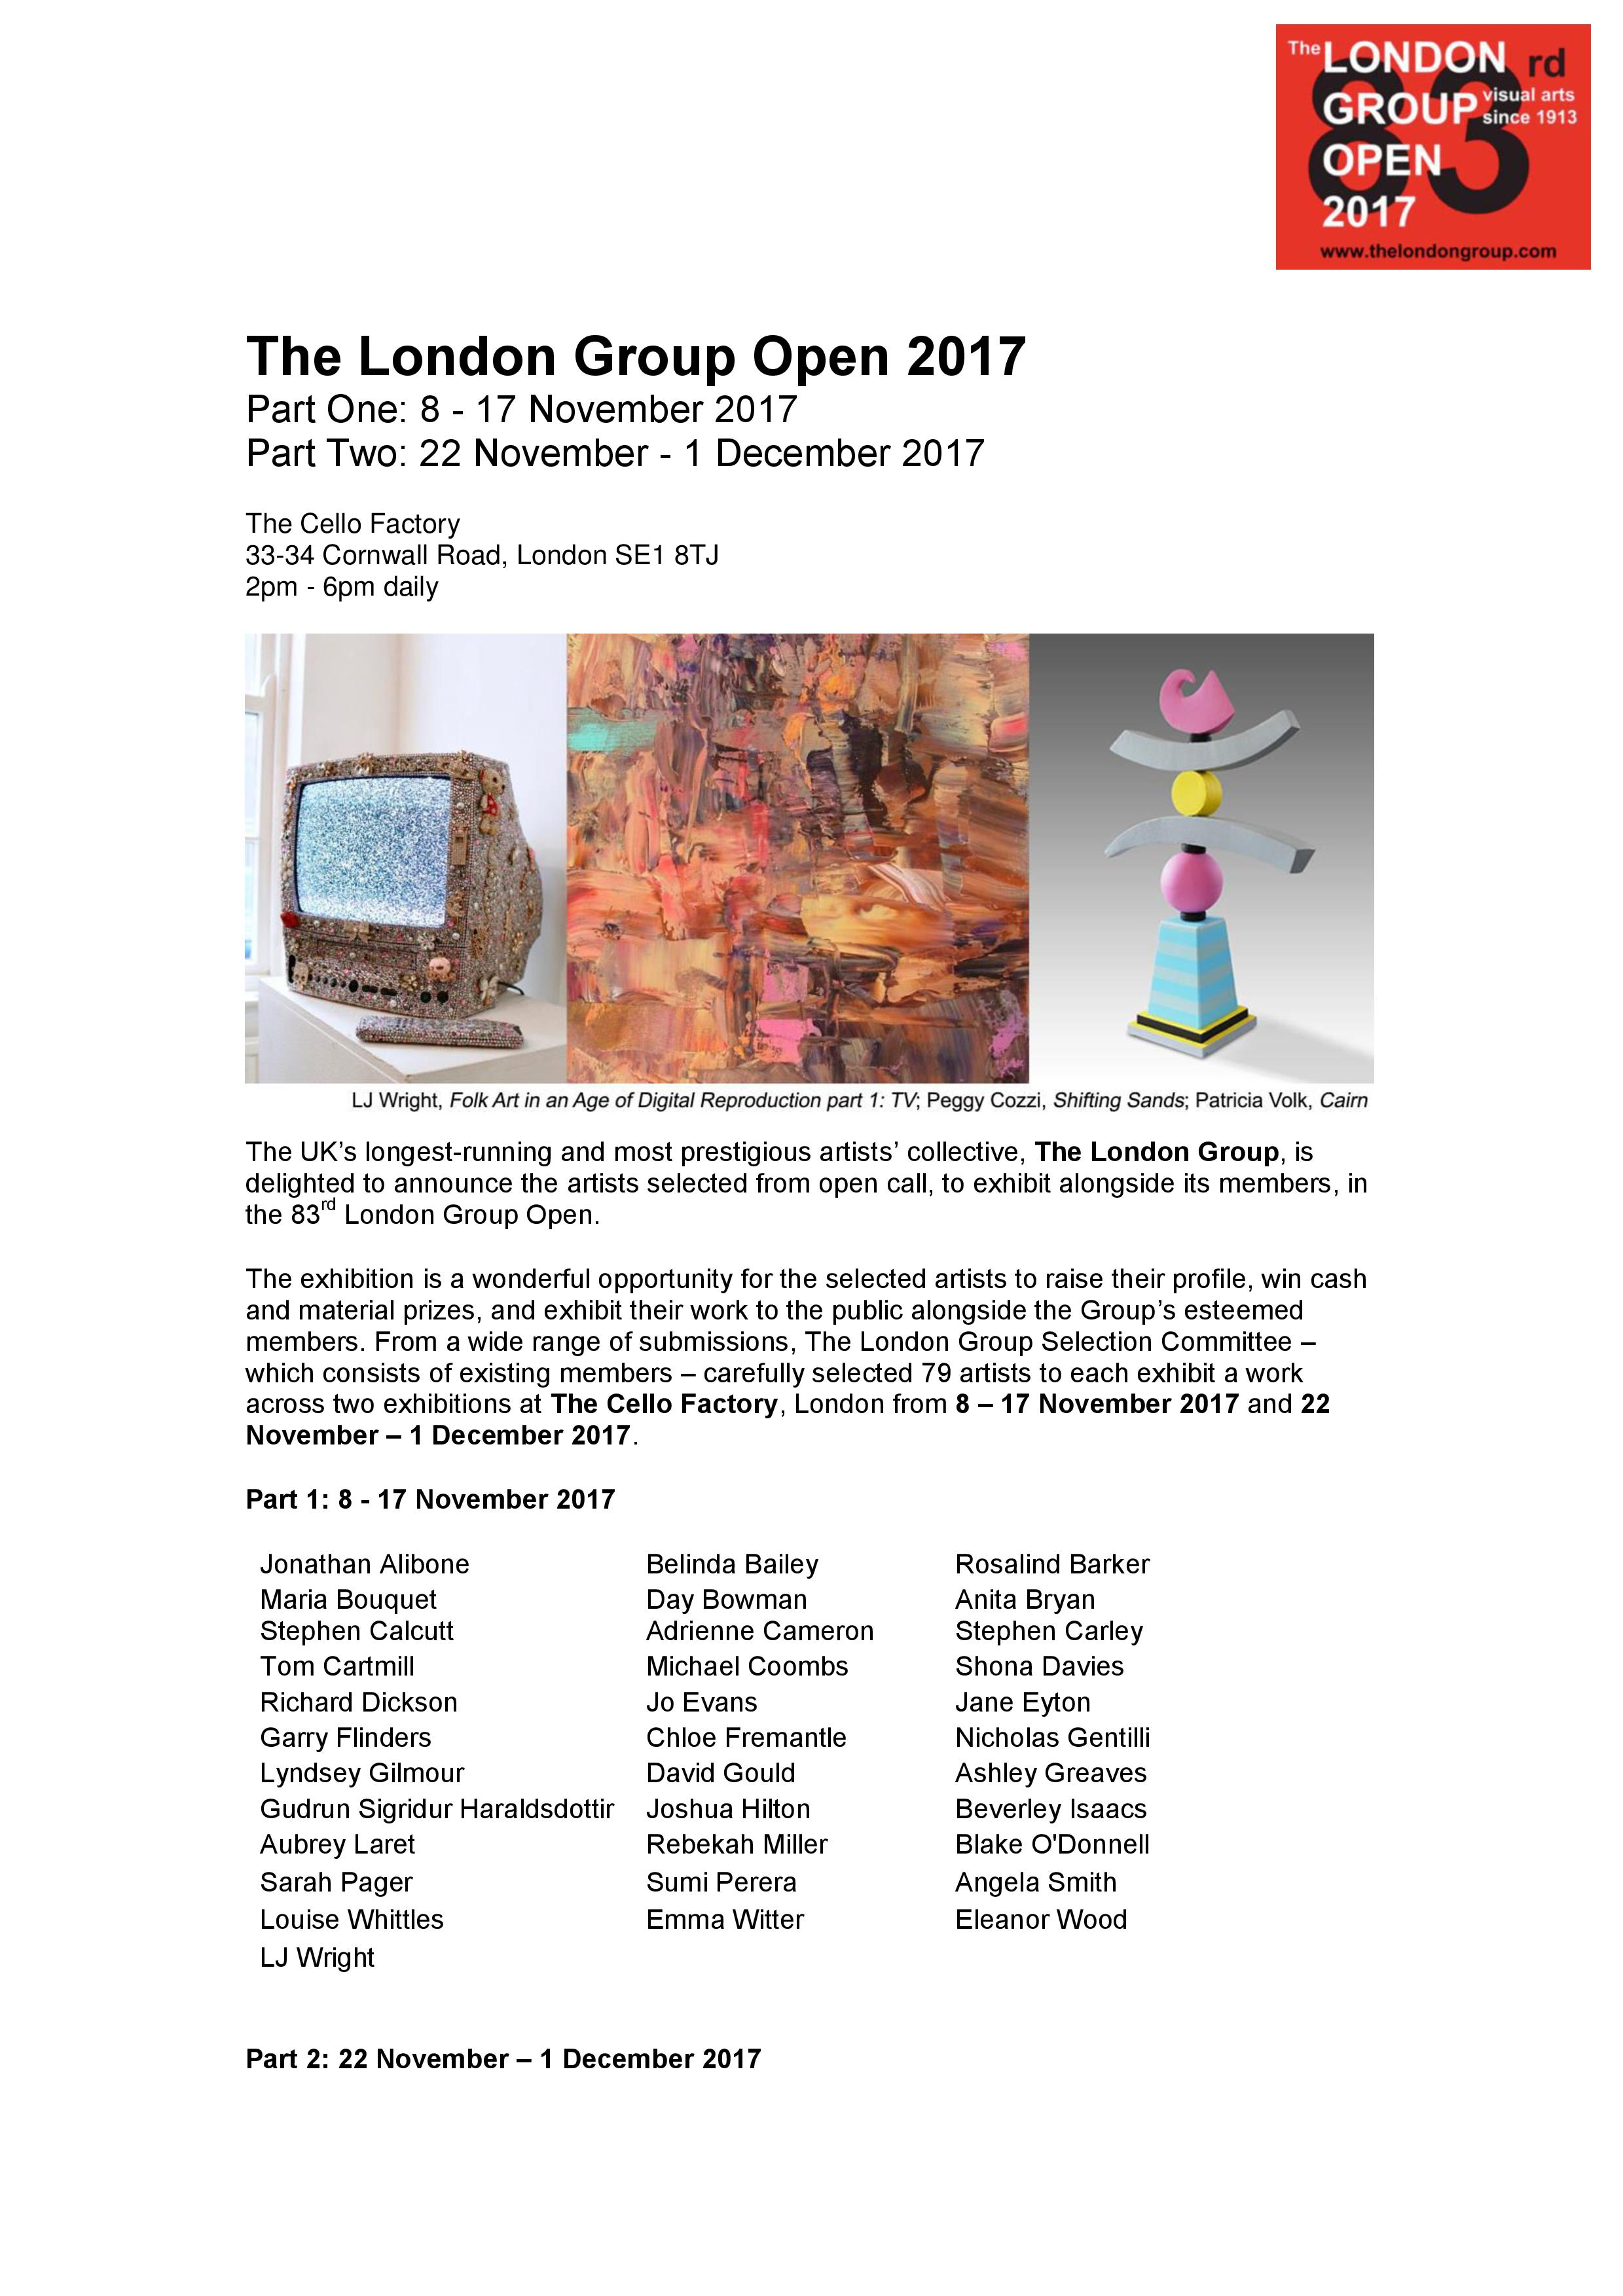 pr46_Open2017 (1)-page-001.jpg